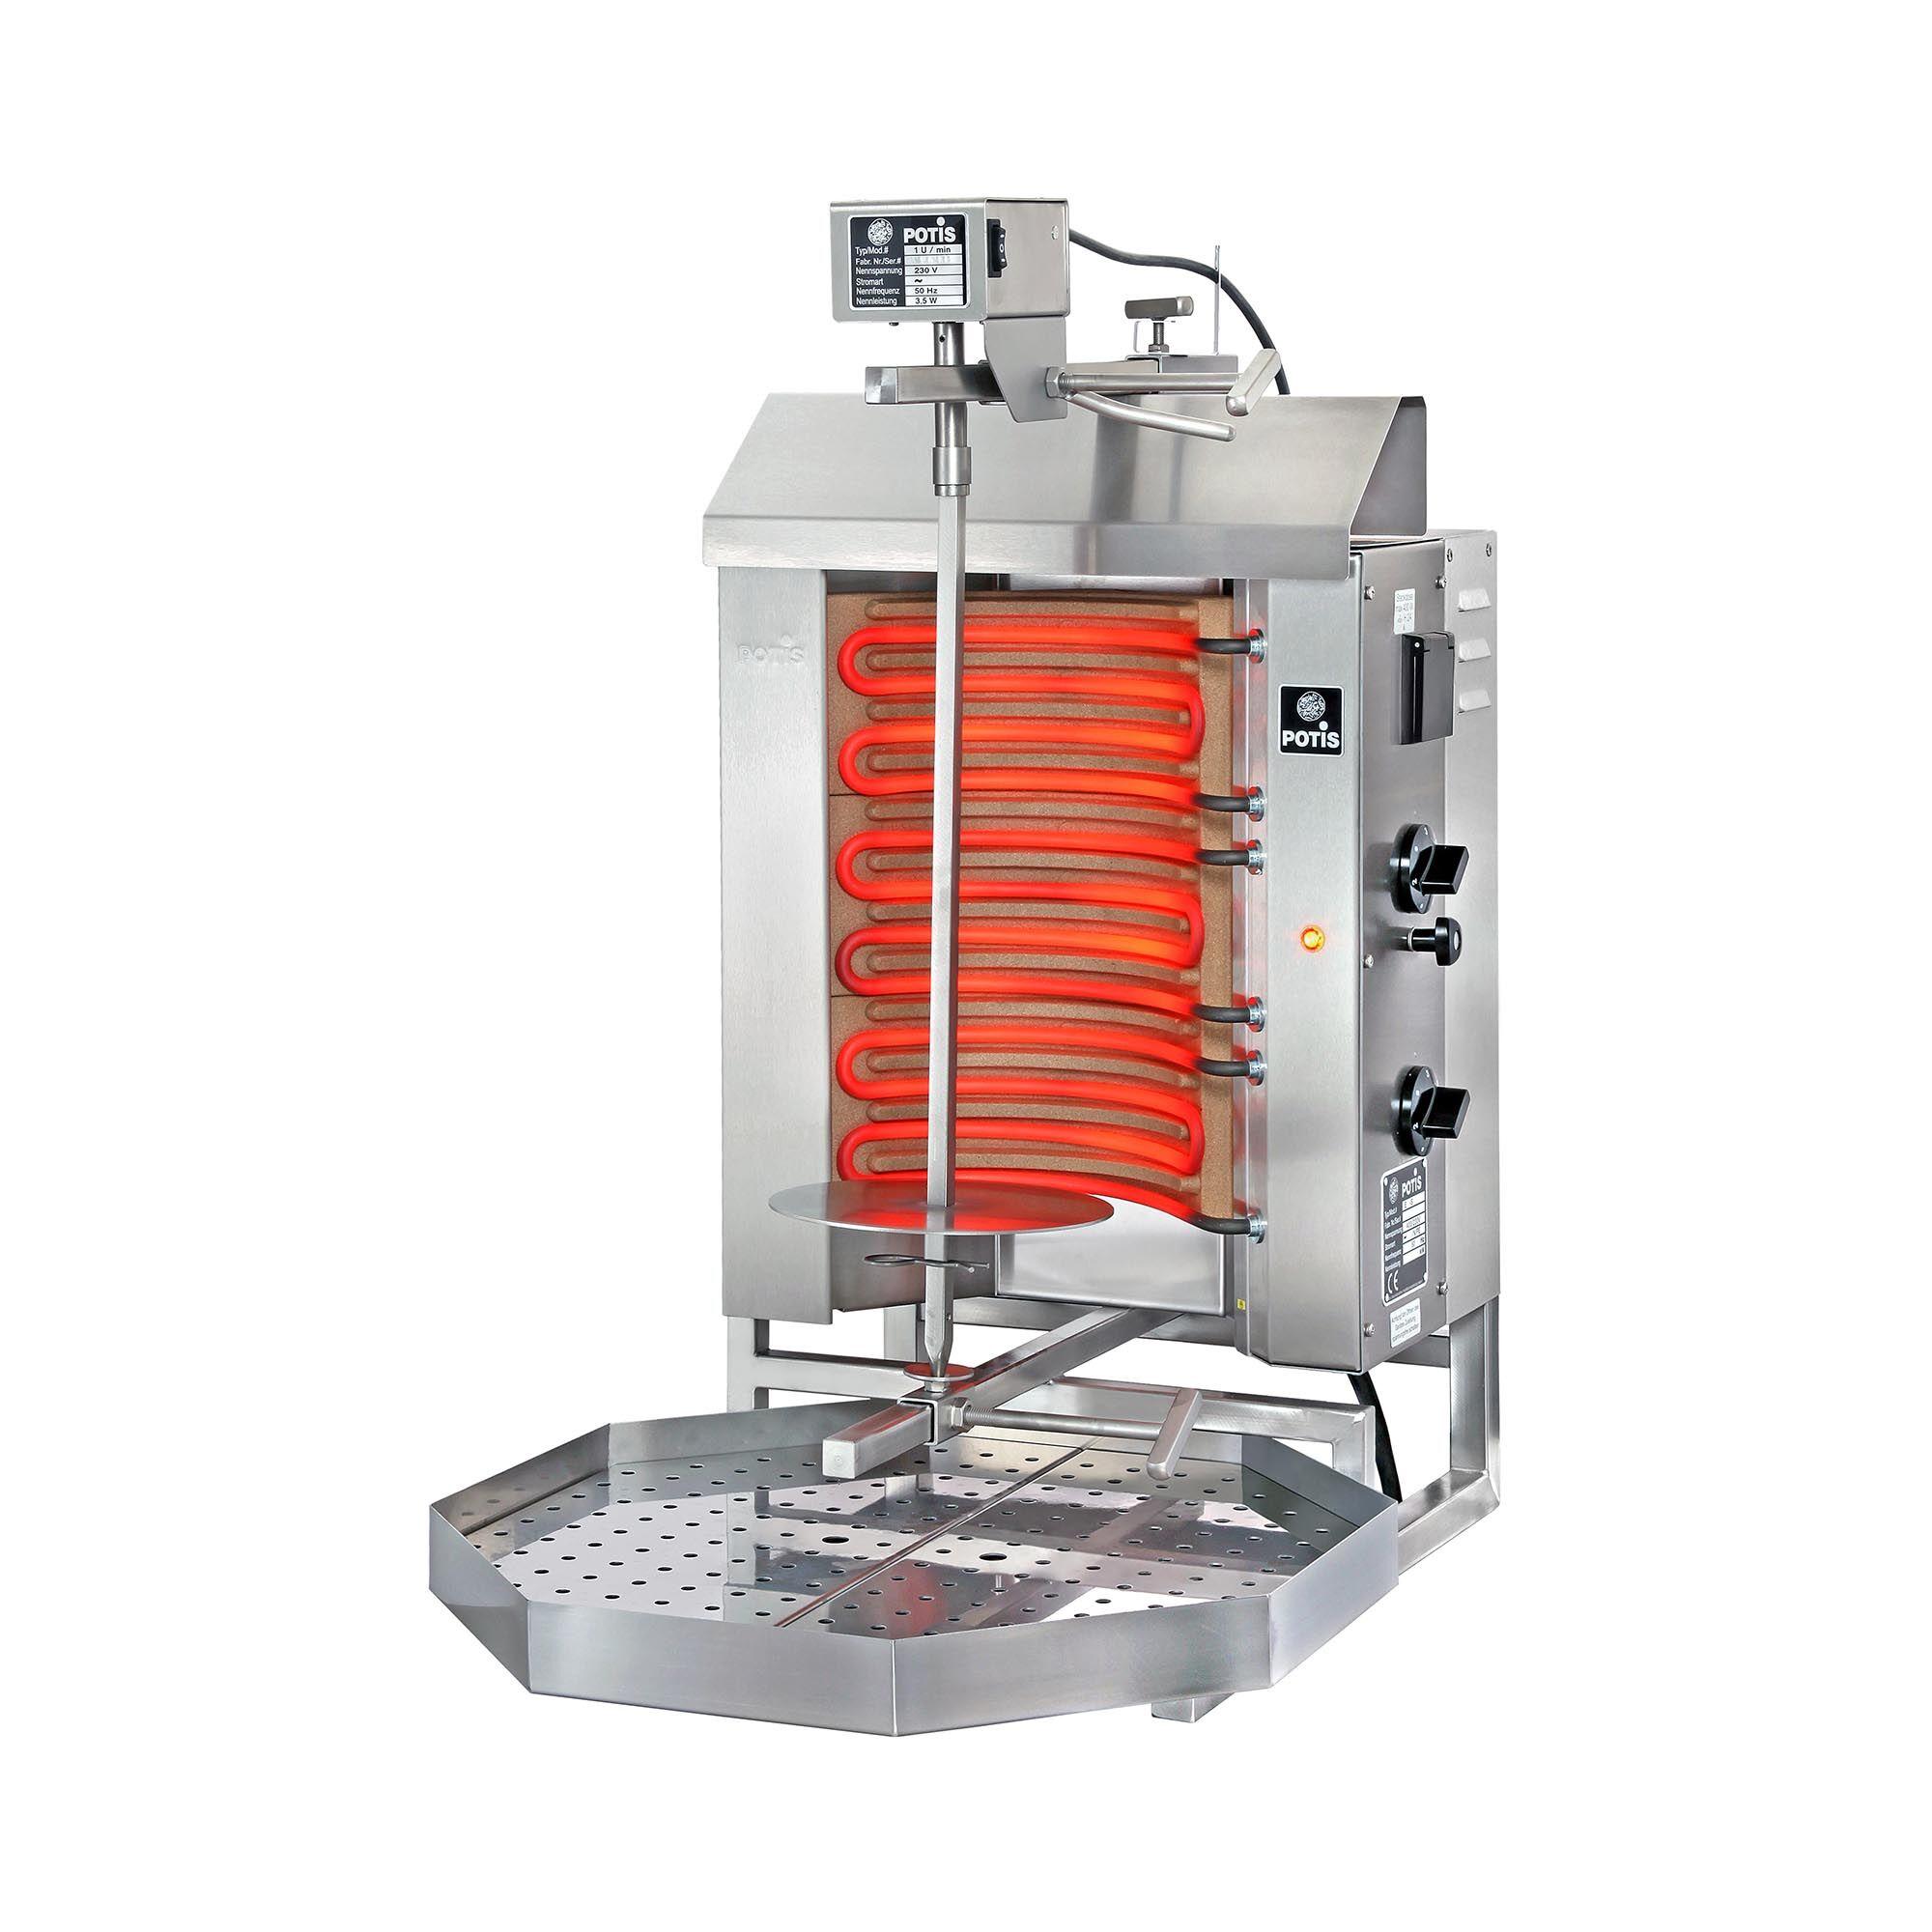 POTIS Dönergrill - 4.500 W - elektrisk POTIS E1-S